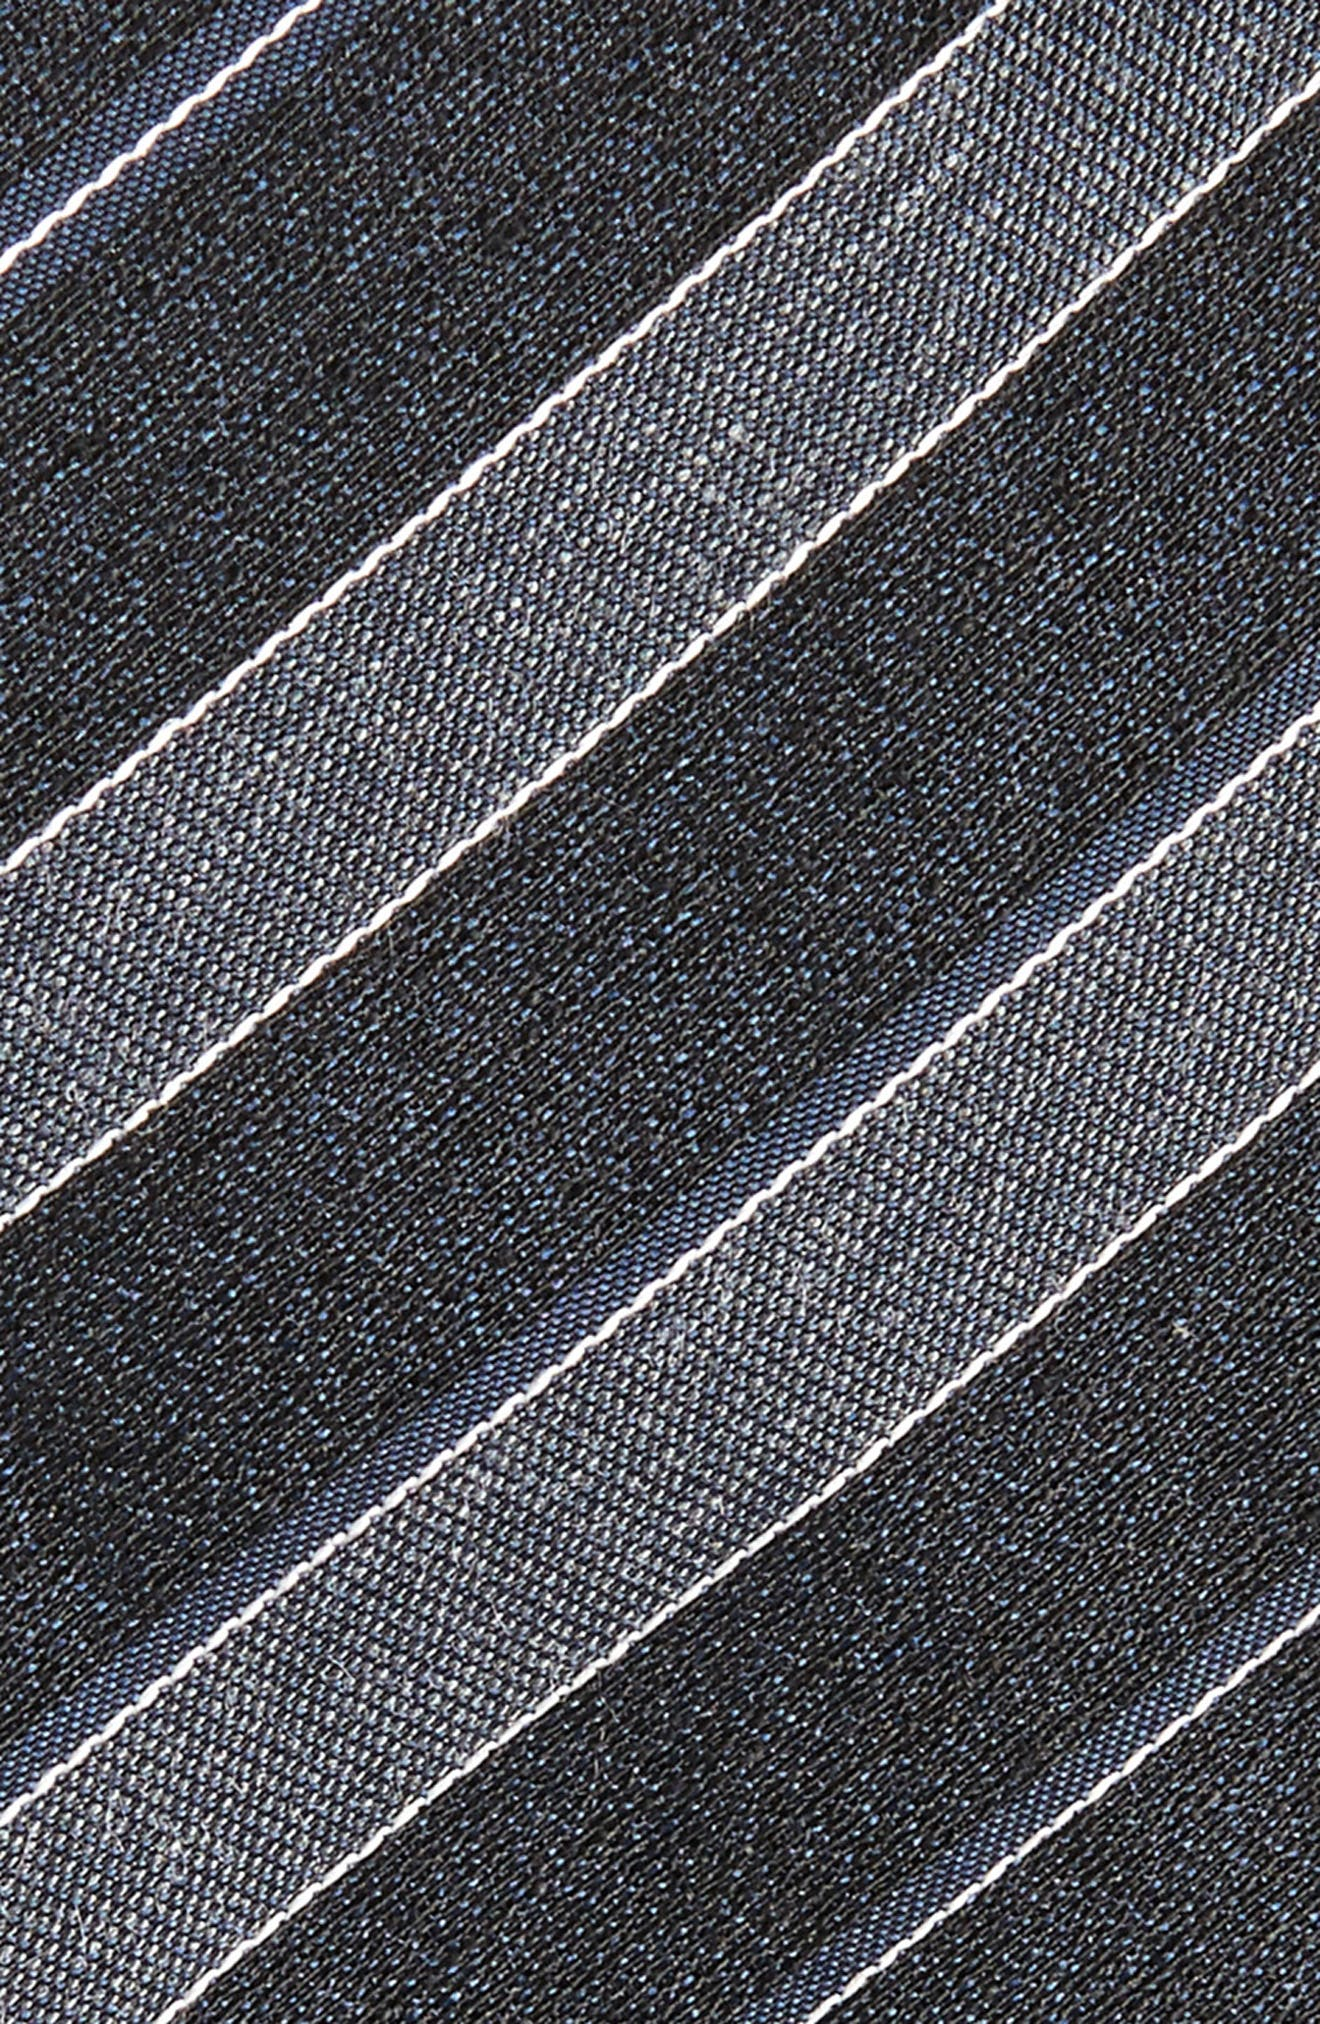 Stripe Silk Blend Tie,                             Alternate thumbnail 2, color,                             Dark Charcoal